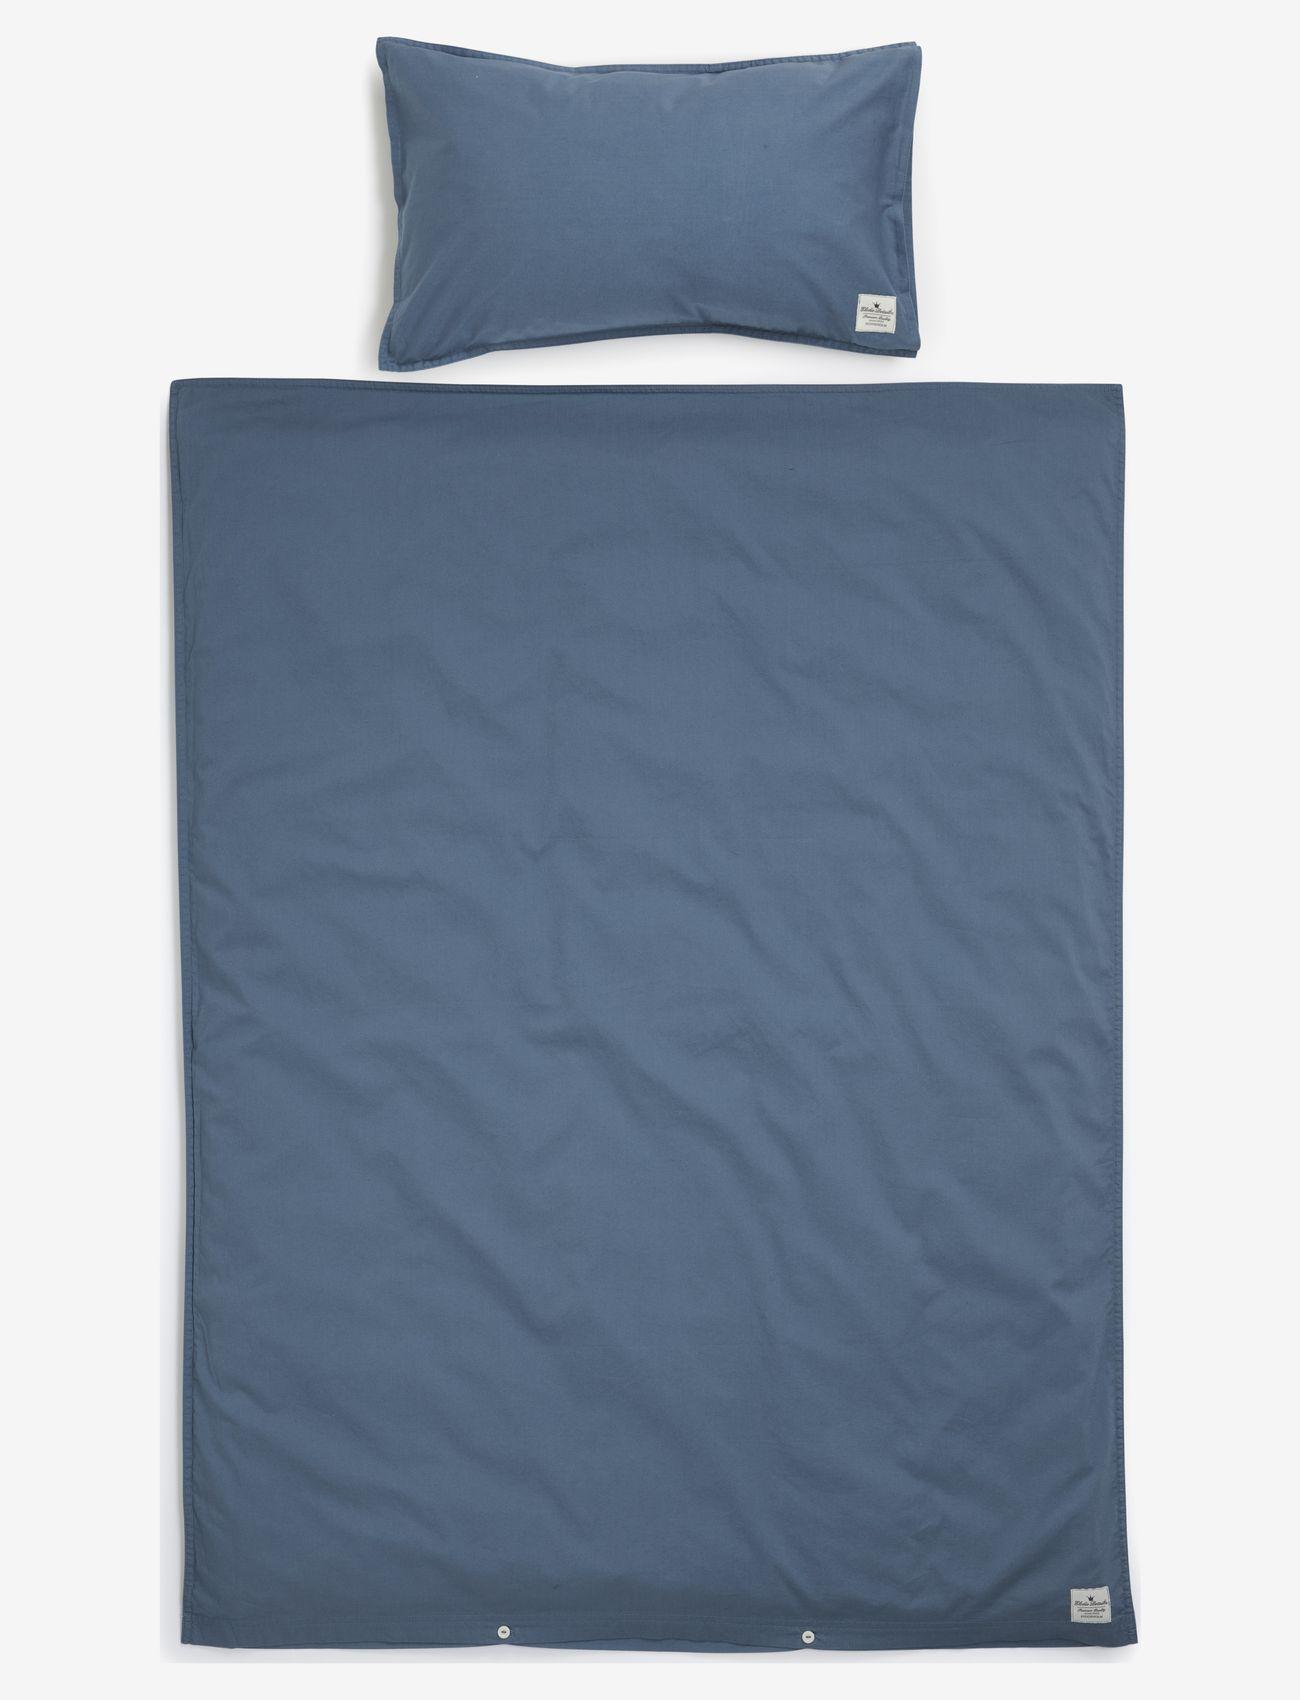 Crib Bedding Set - Tender Blue